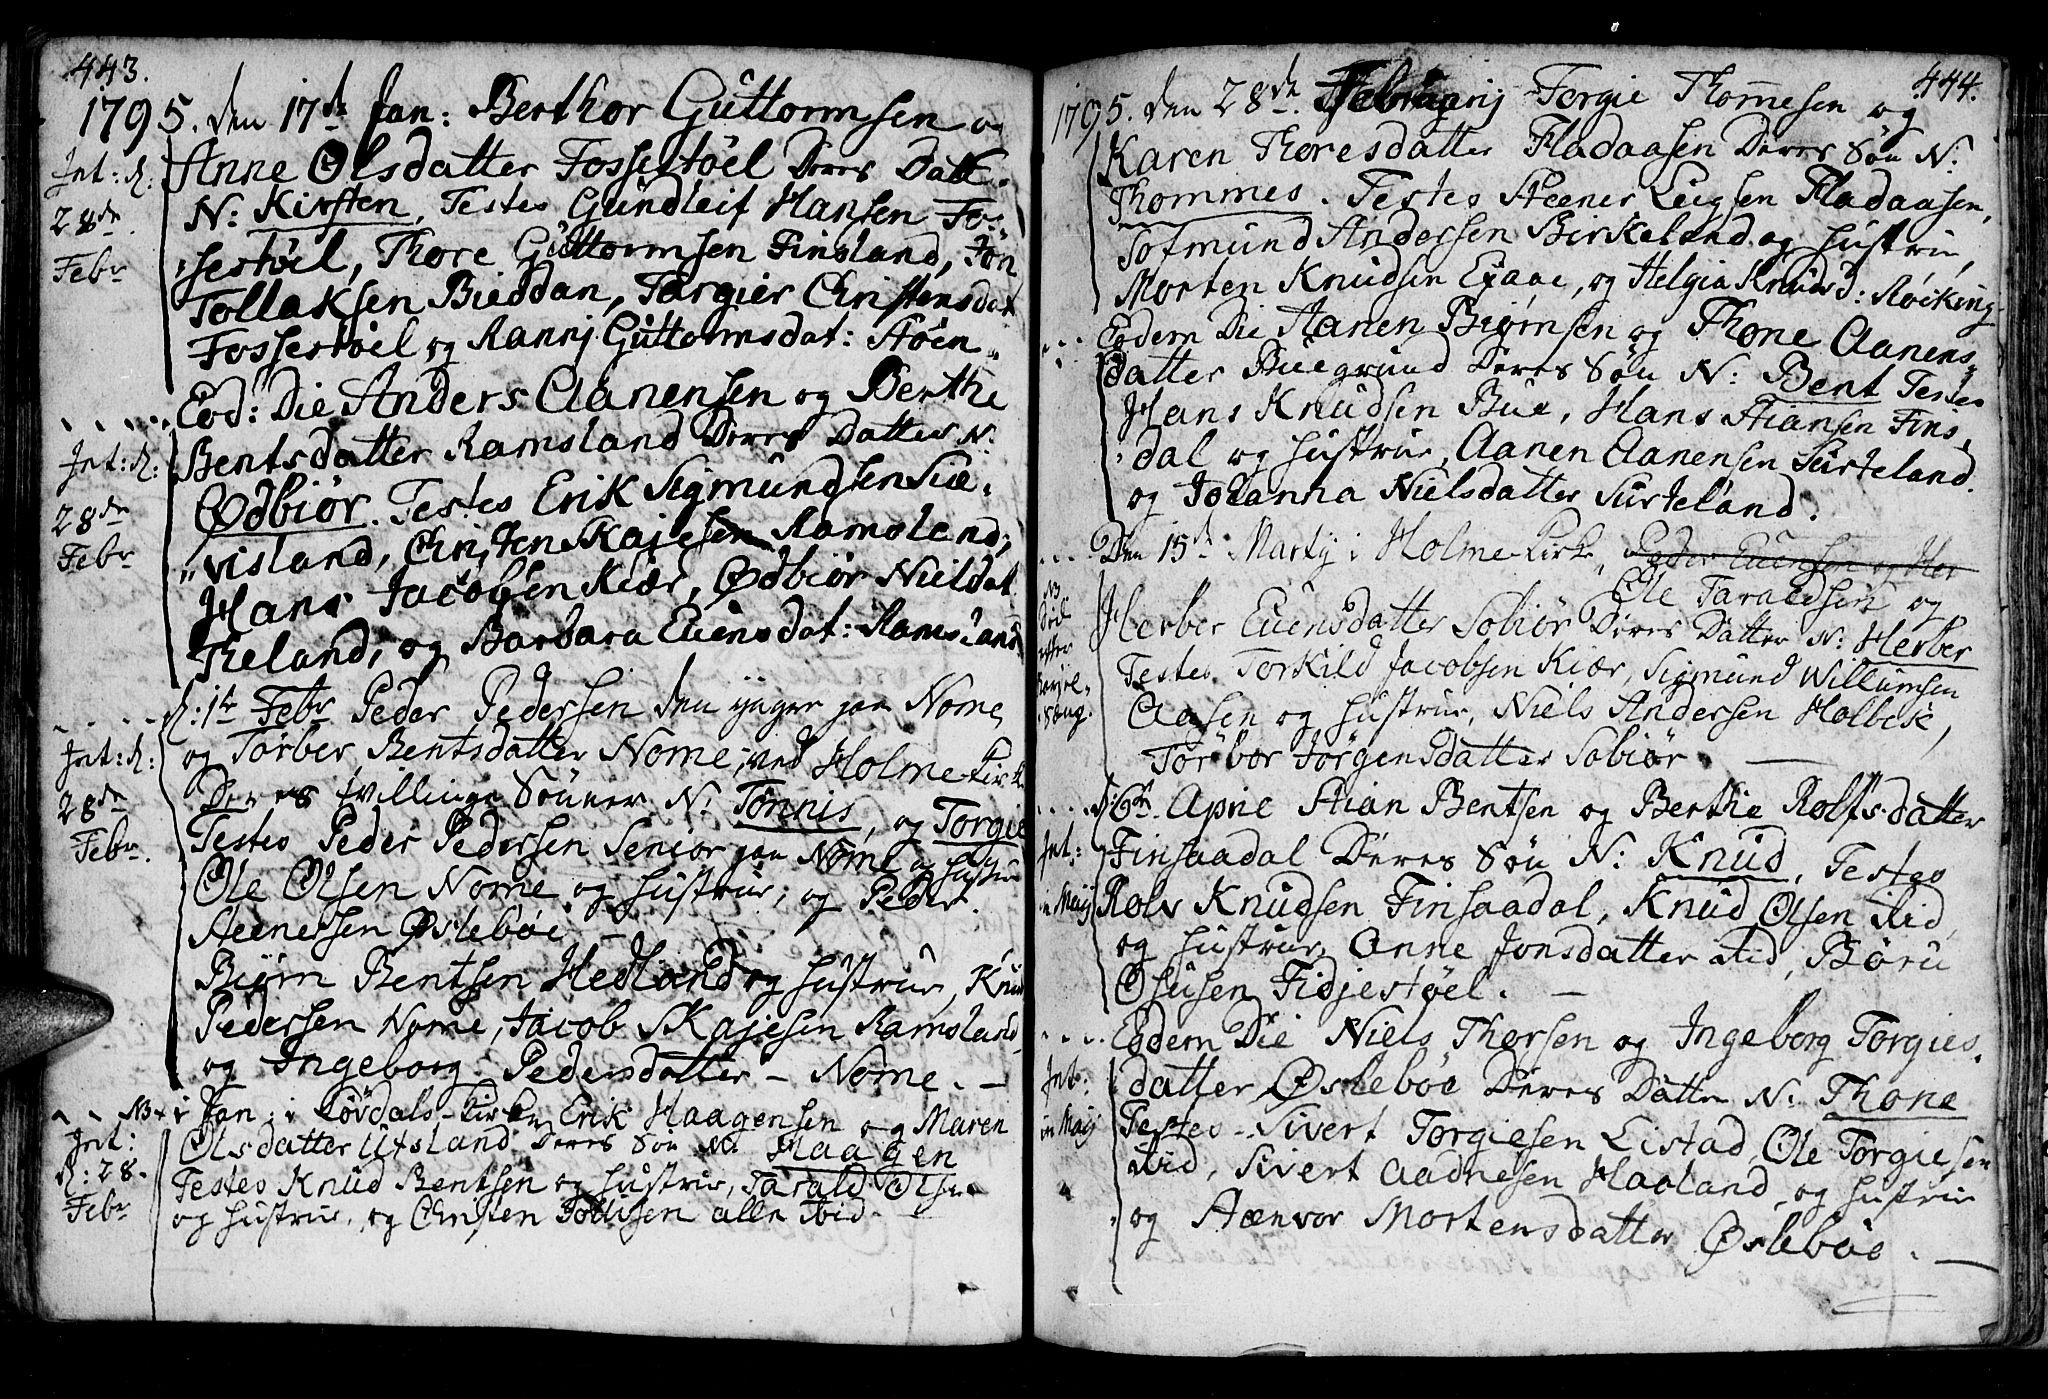 SAK, Holum sokneprestkontor, F/Fa/Fac/L0001: Ministerialbok nr. A 1, 1773-1820, s. 443-444